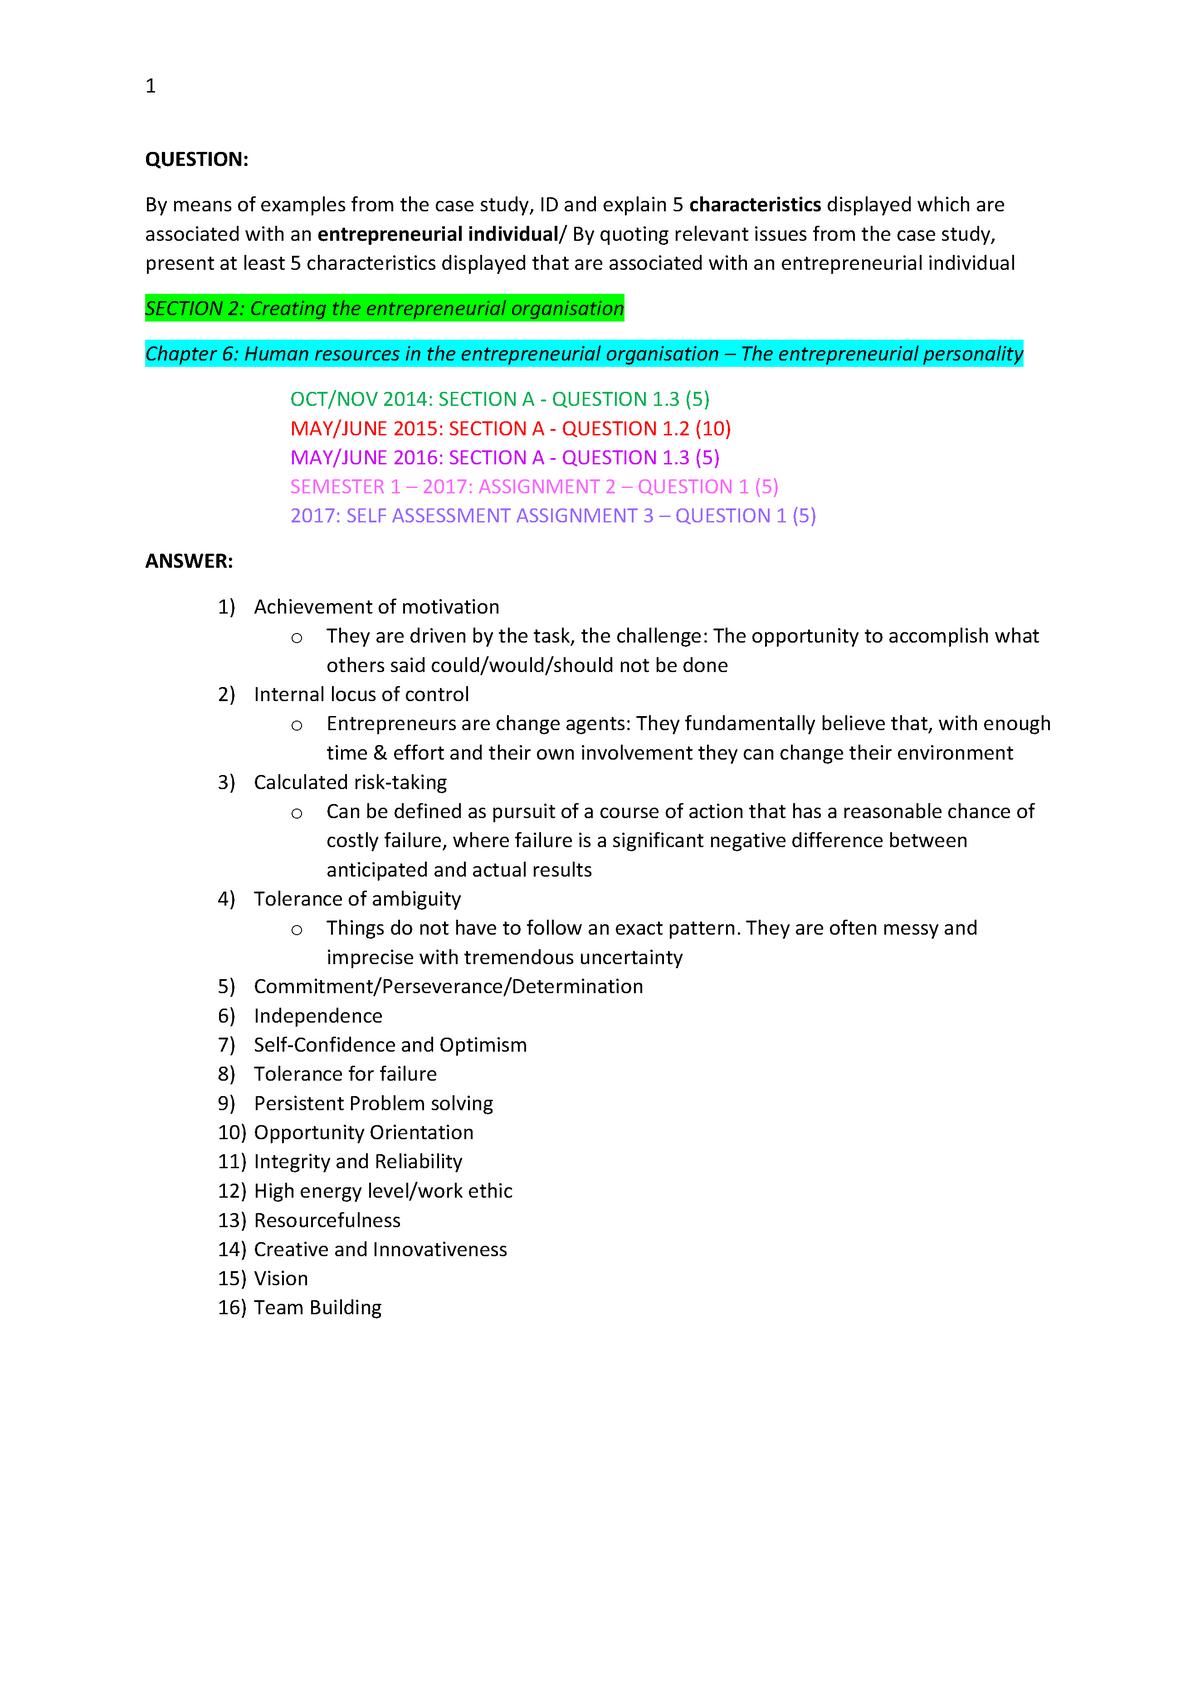 Exams-combined- Summary - MNB3701 - StuDocu